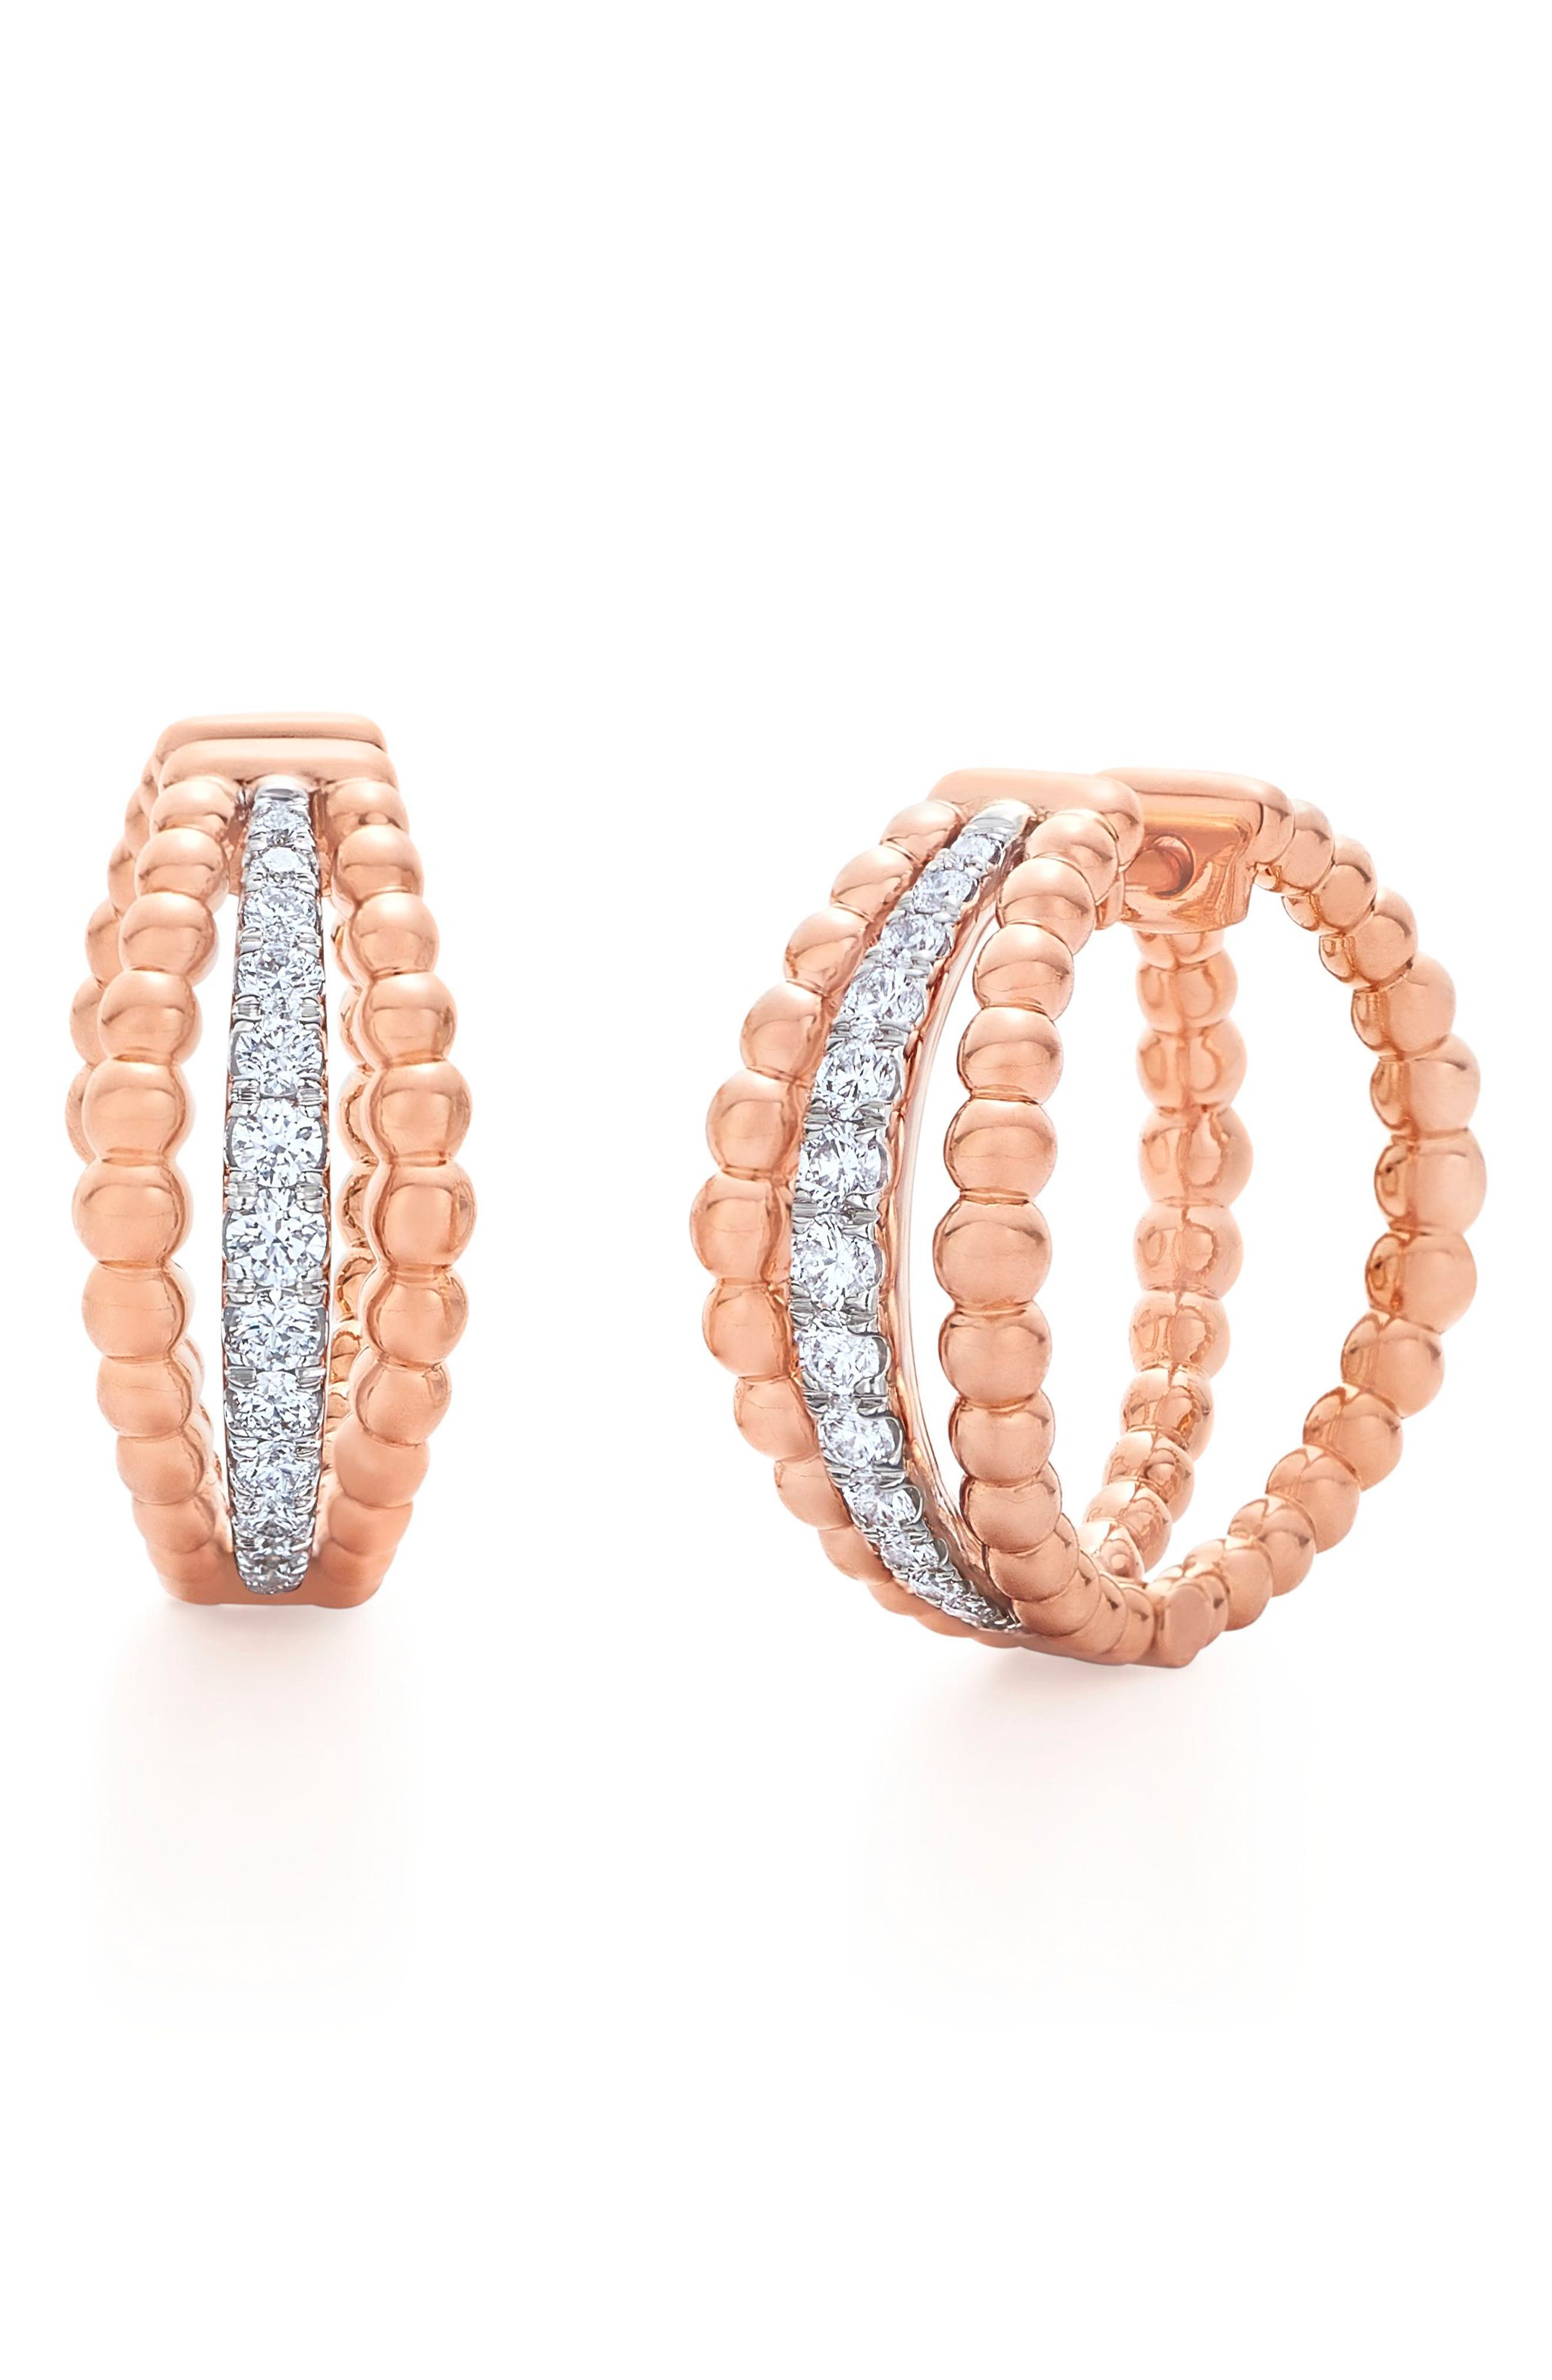 Beaded Multirow Diamond Hoop Earrings,                         Main,                         color, Rose Gold